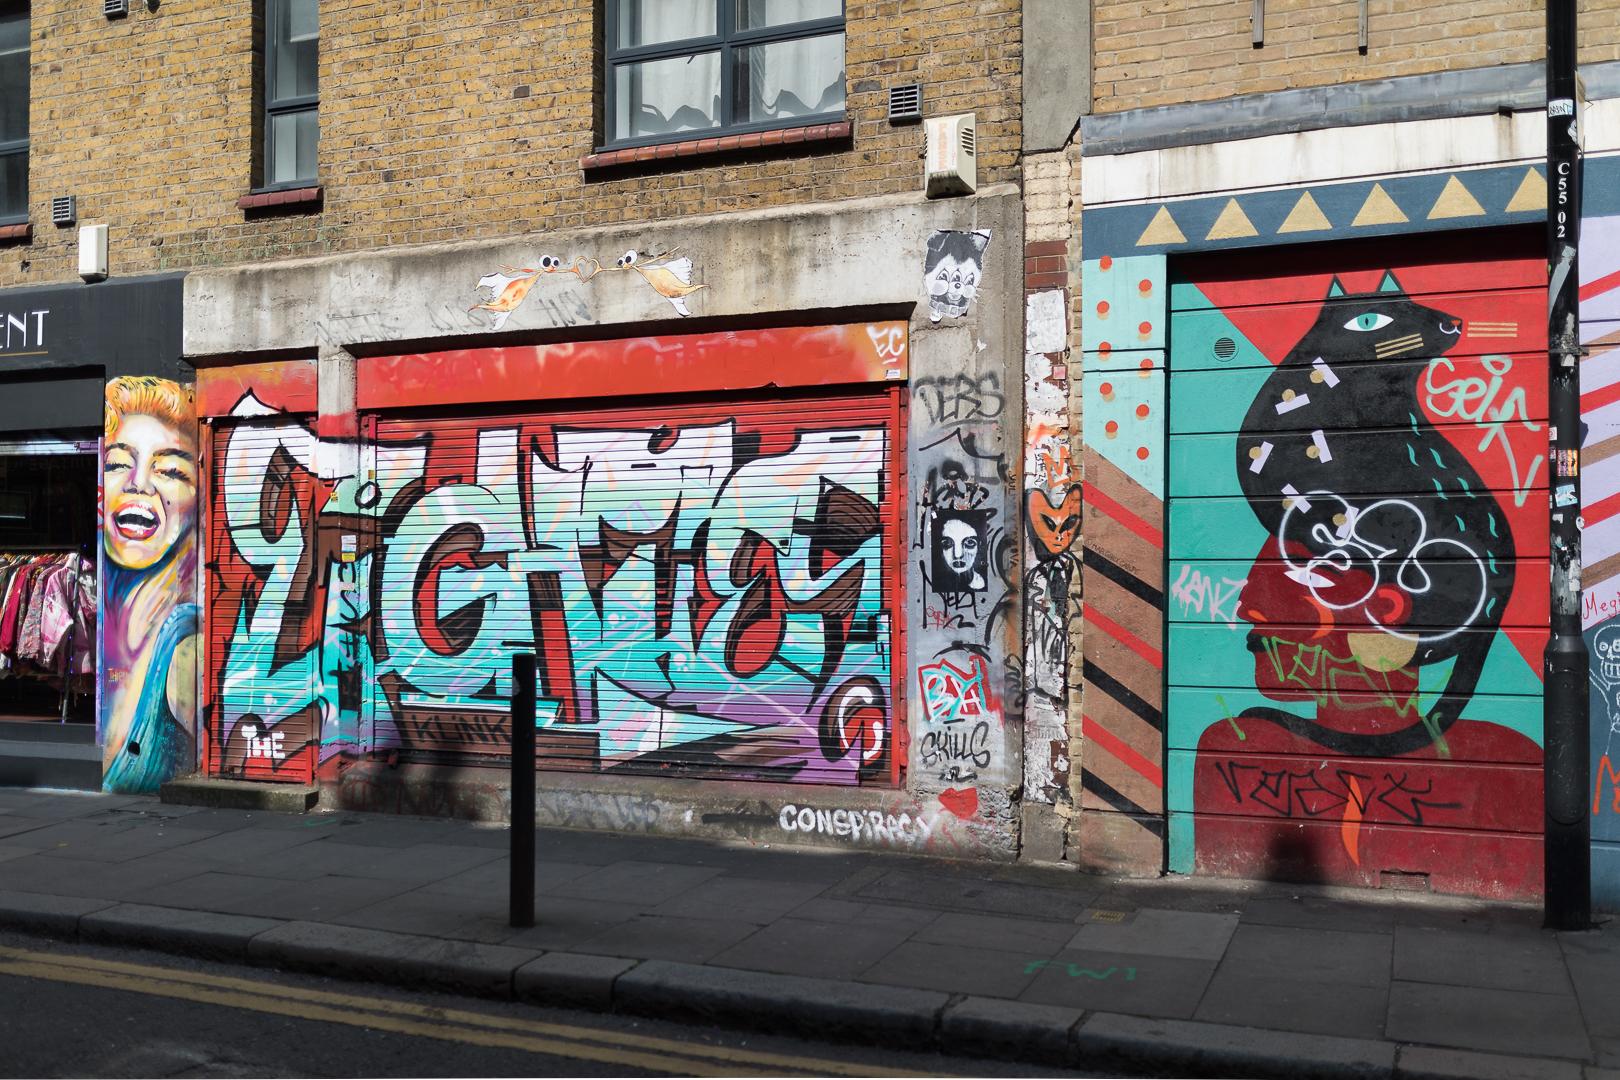 Brick Lane Graffiti / London